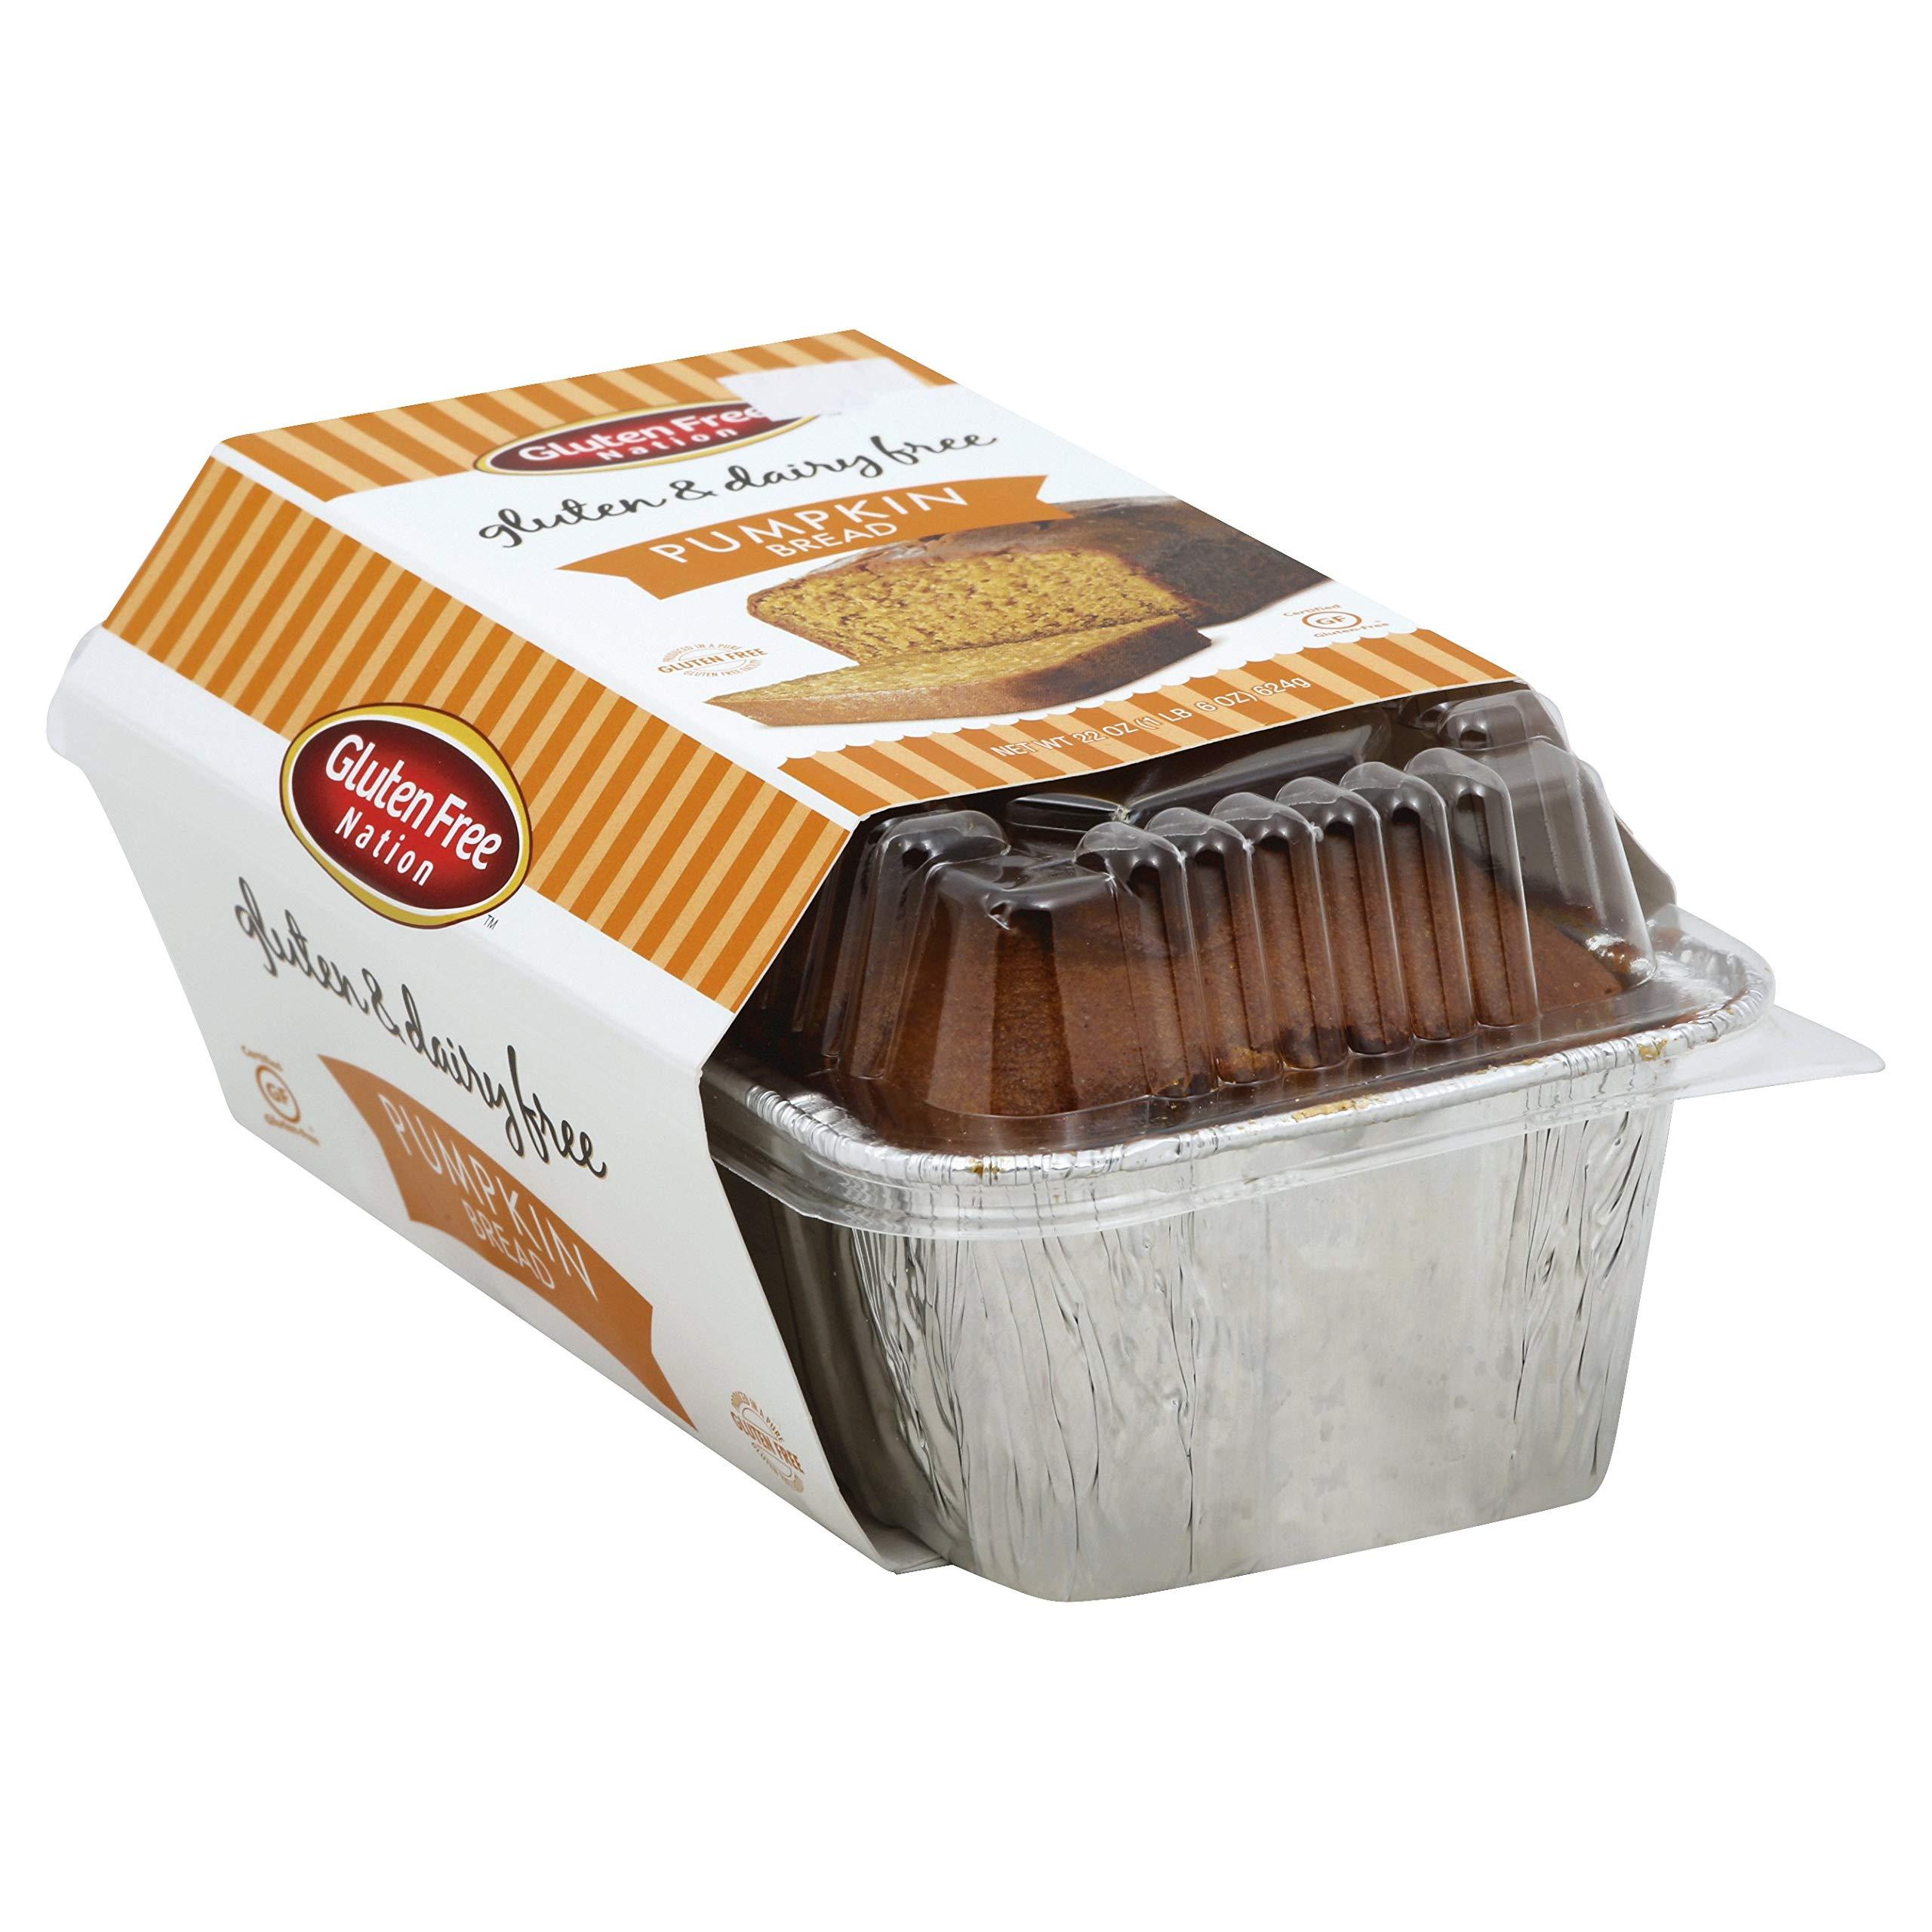 Gluten Free Dairy Free Pumpkin Bread 22 oz. (case of six 22 oz. loaves) by Gluten Free Nation